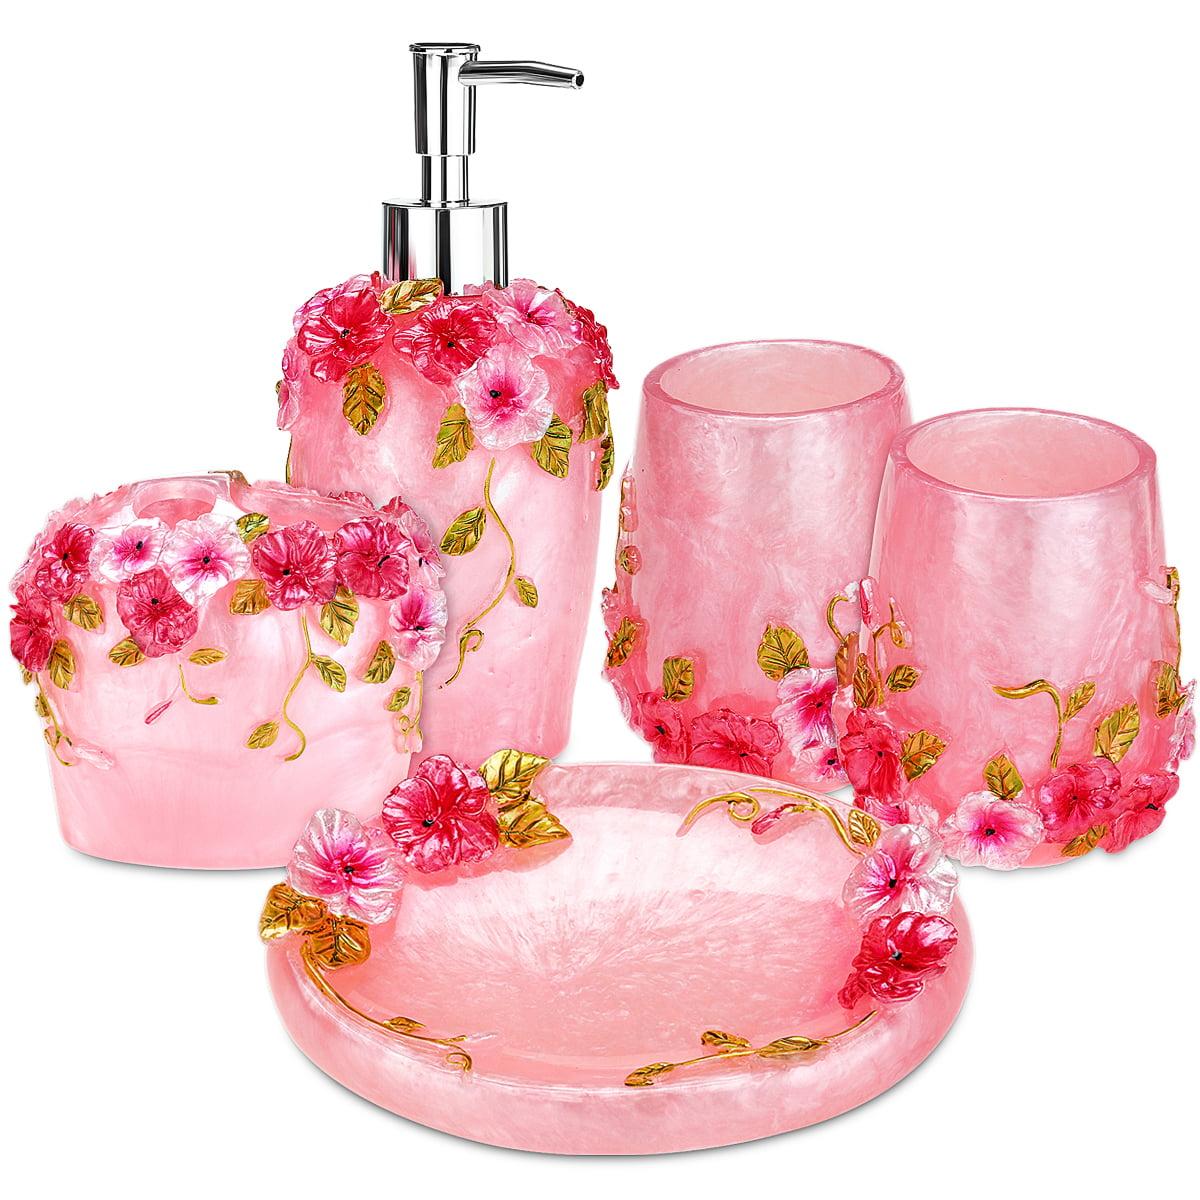 5 Piece Bathroom Accessories Set, Bathroom Toothbrush Holder Set